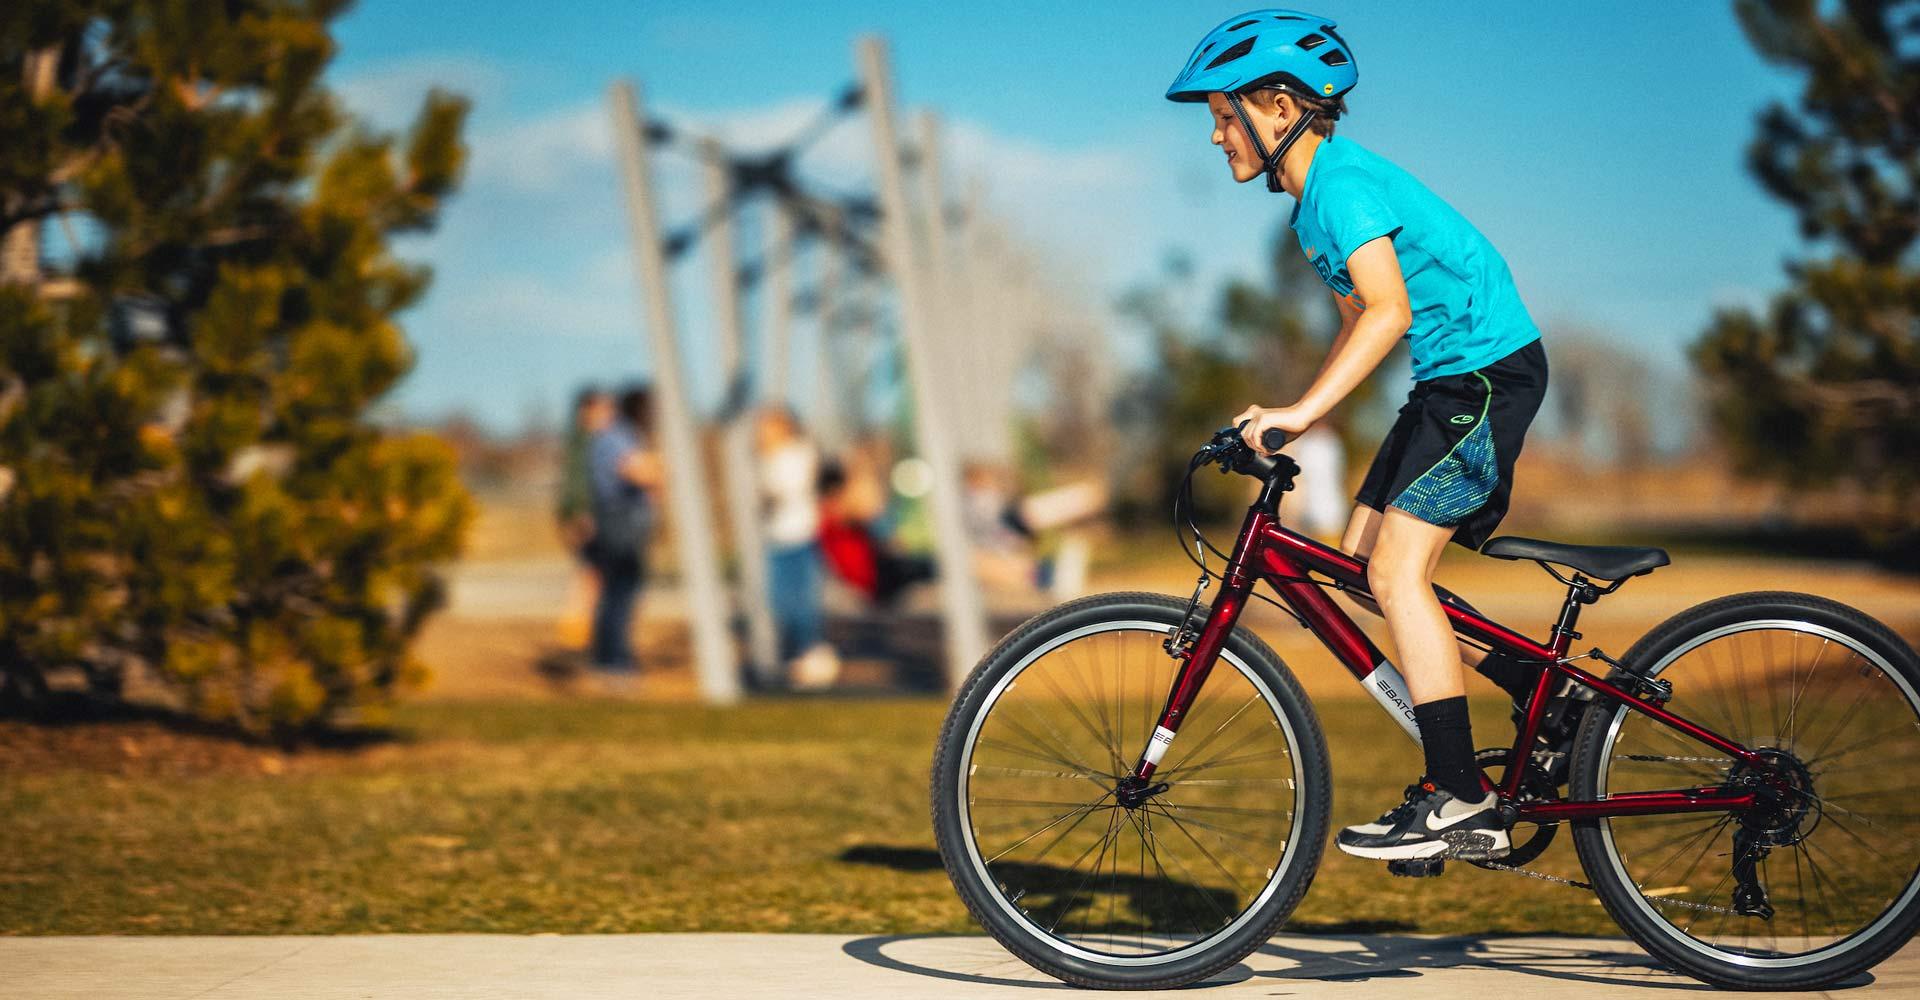 Batch Youth Lifestyle Bike